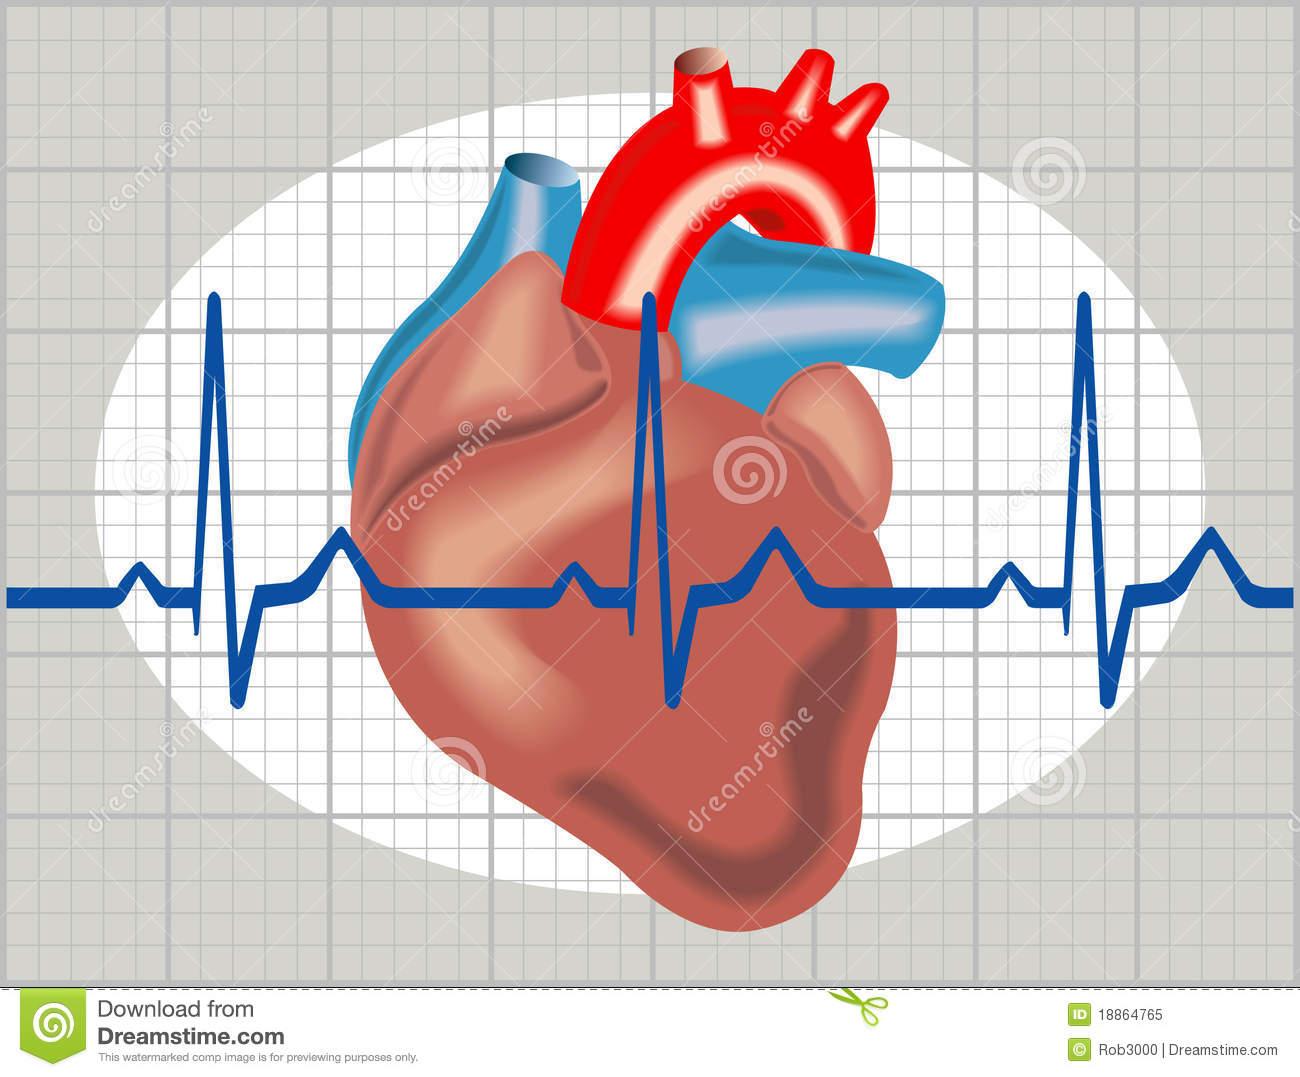 Cardiac arrhythmia clipart clipart download Cardiac arrhythmia | Clipart Panda - Free Clipart Images clipart download